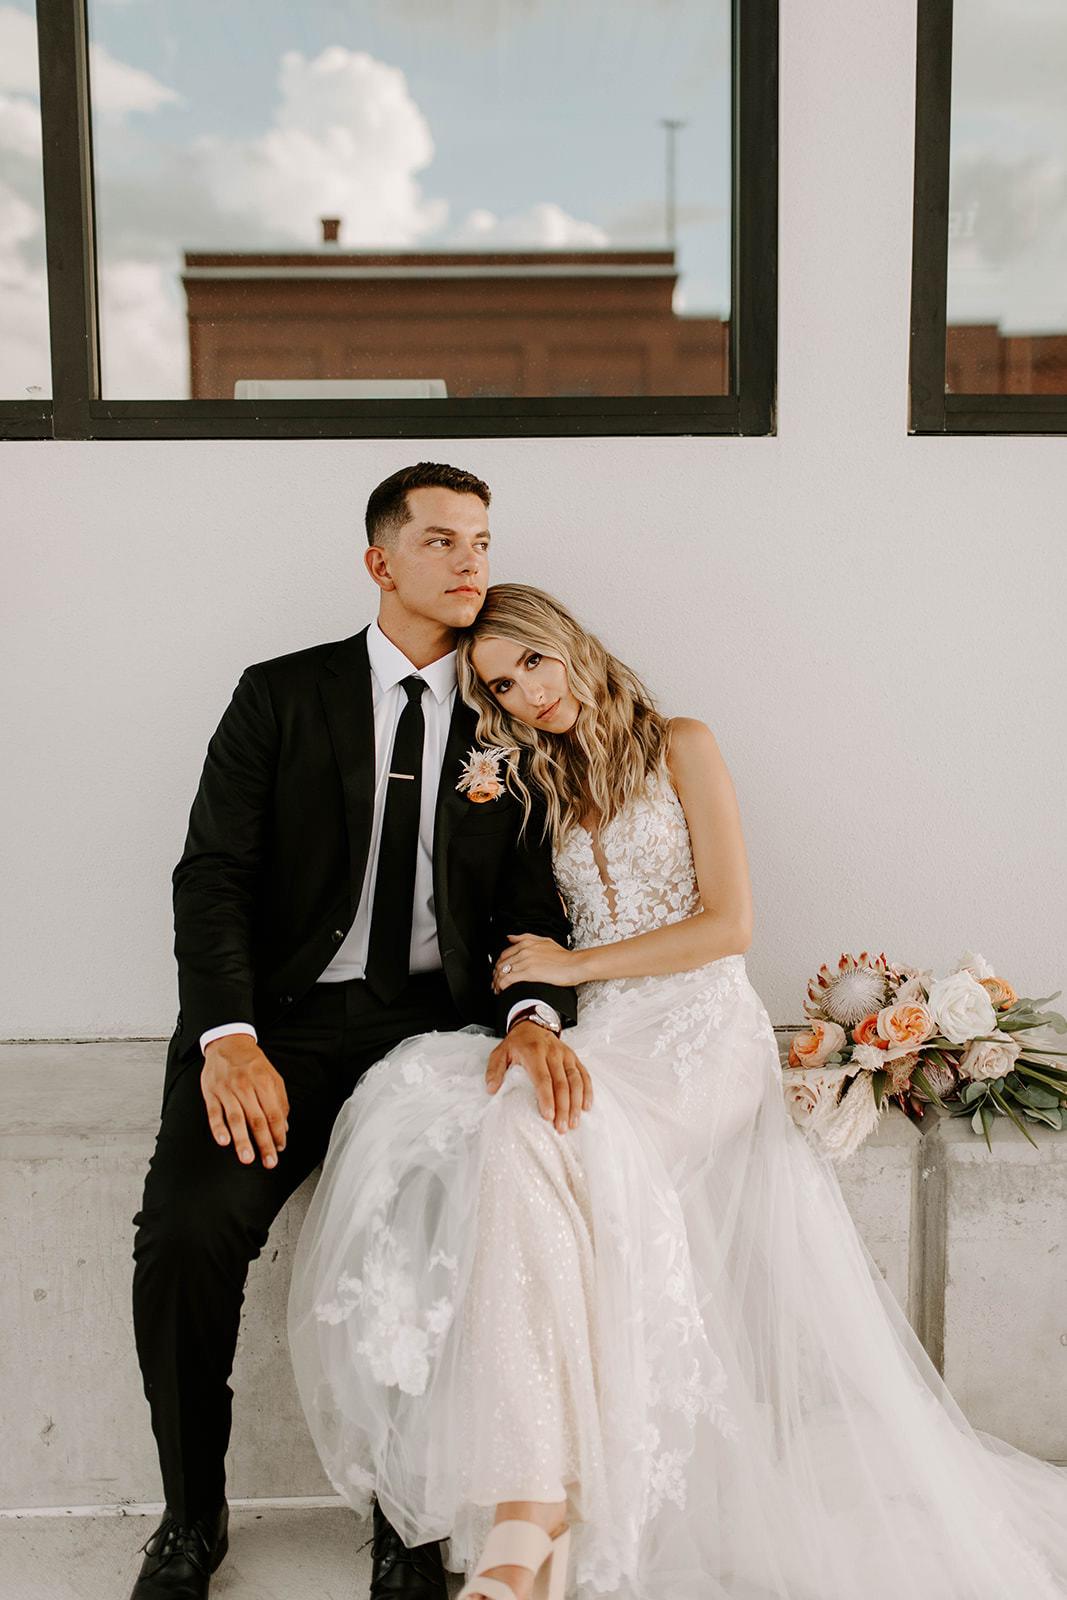 Romantic Boho Bride and Groom Wedding Portrait